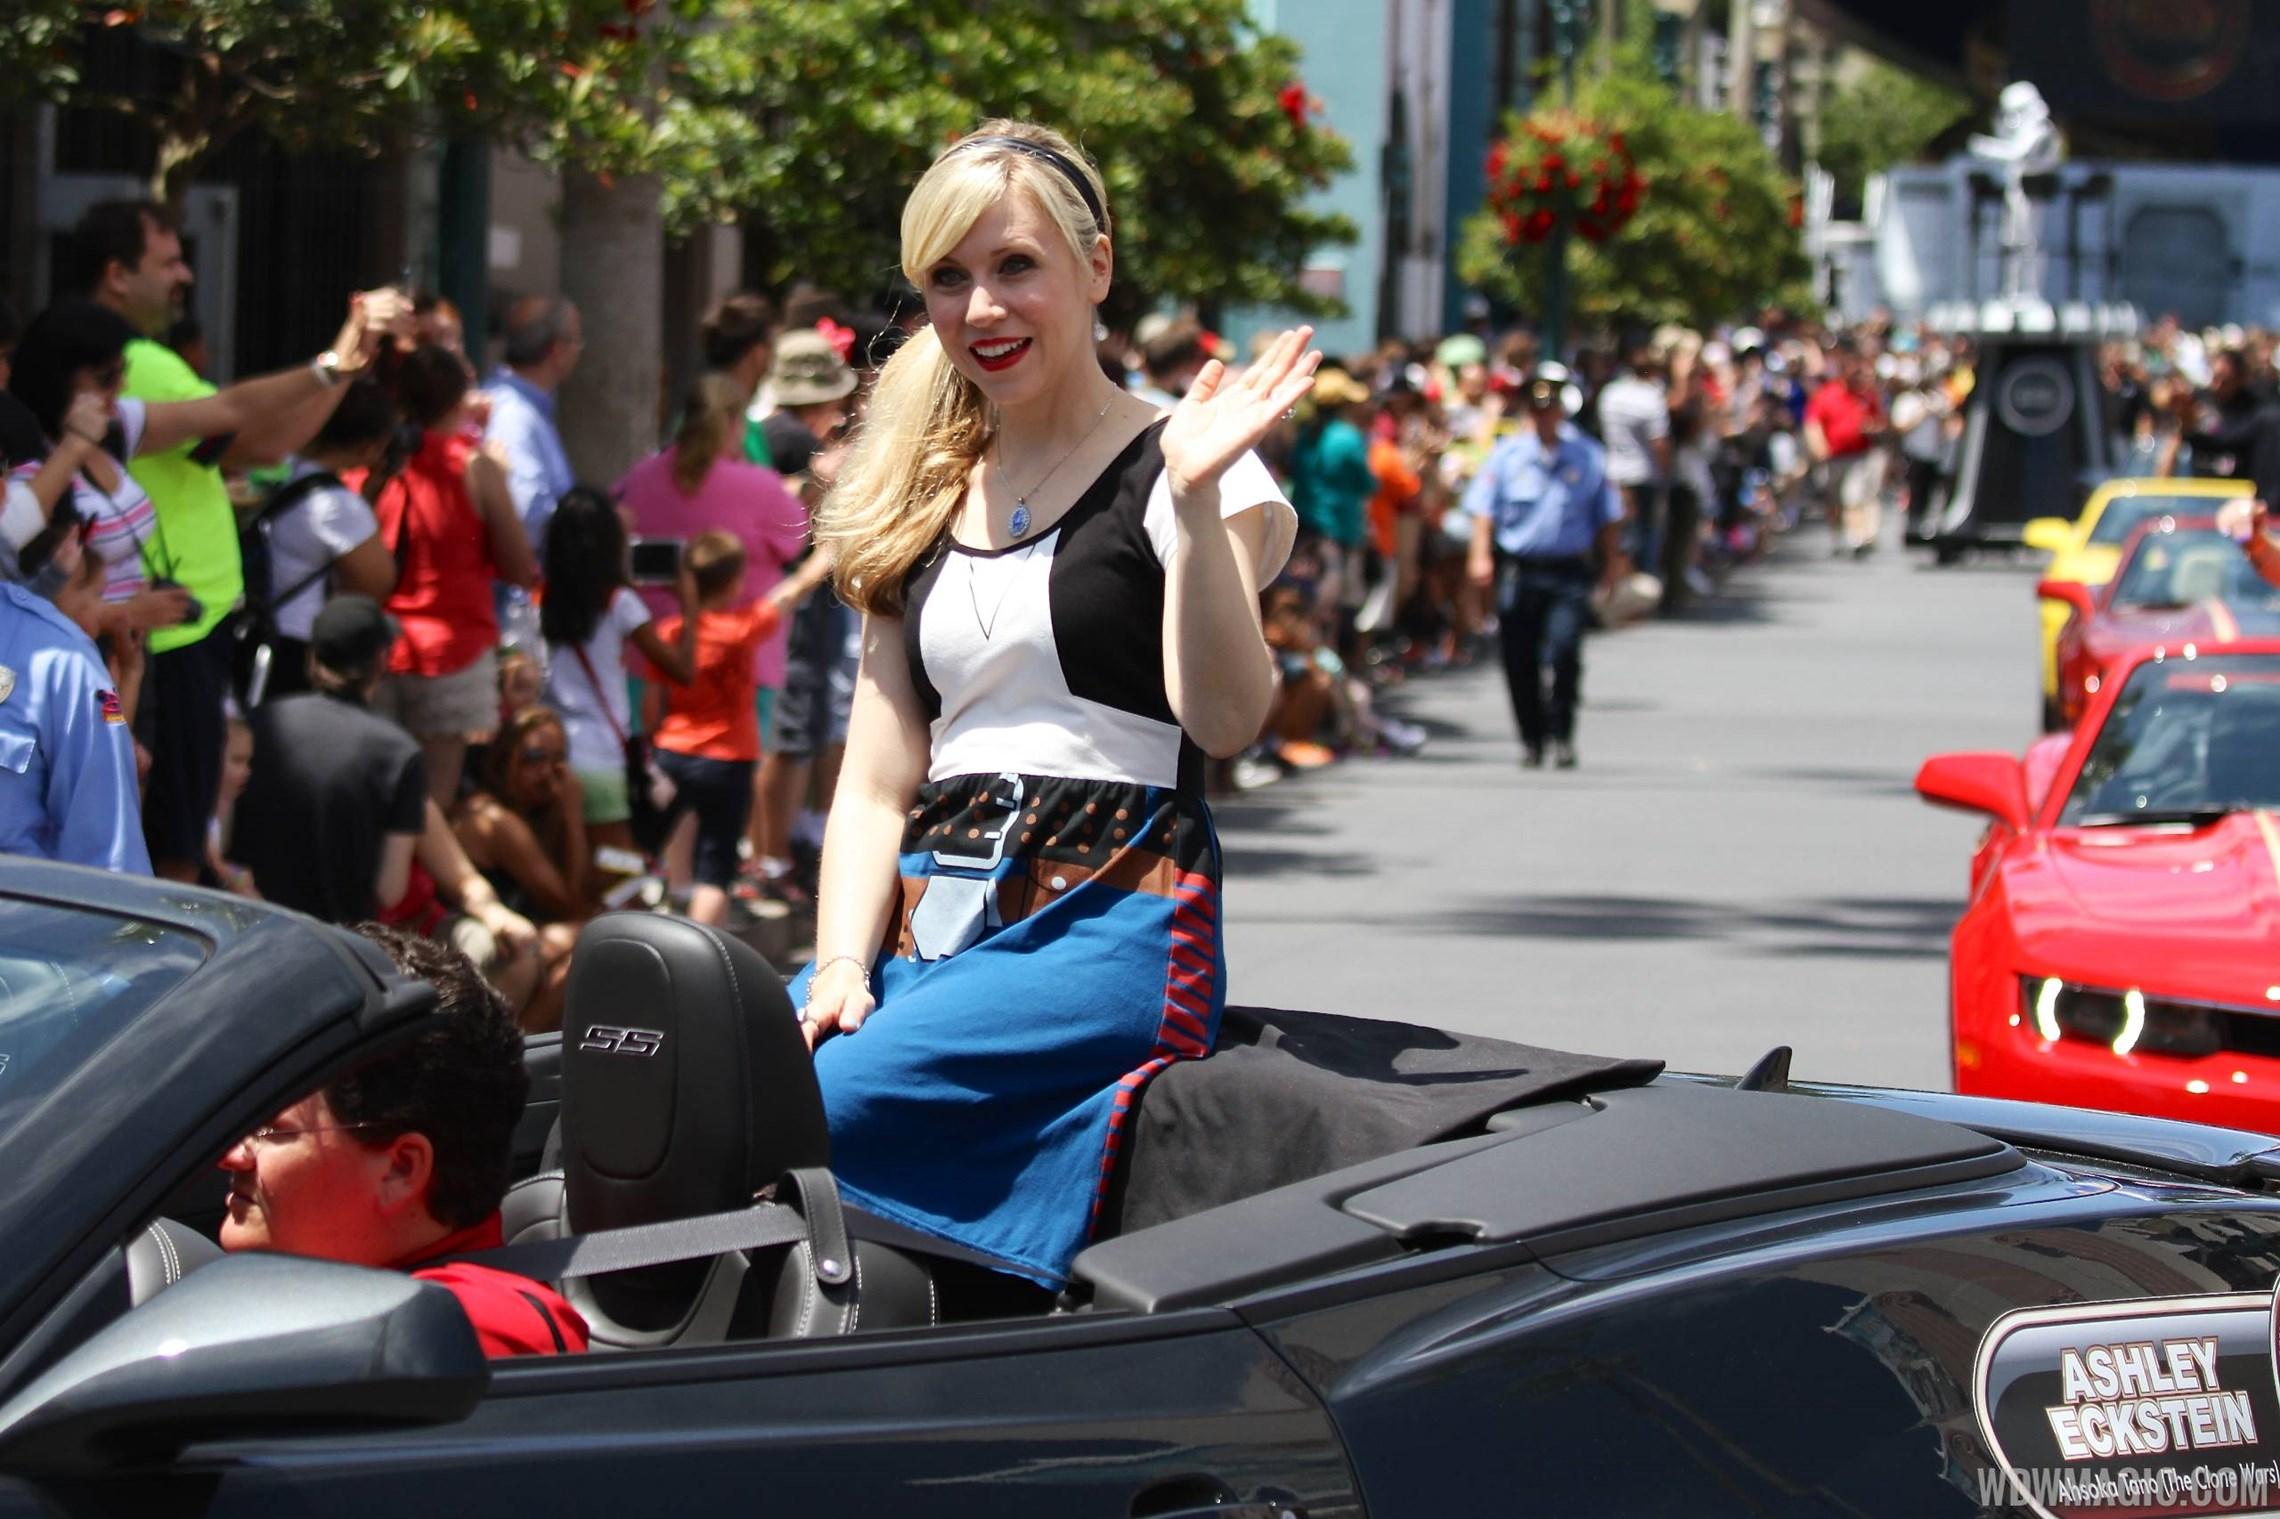 2014 Star Wars Weekends - Weekend 1 Legends of the Force motorcade celebrities